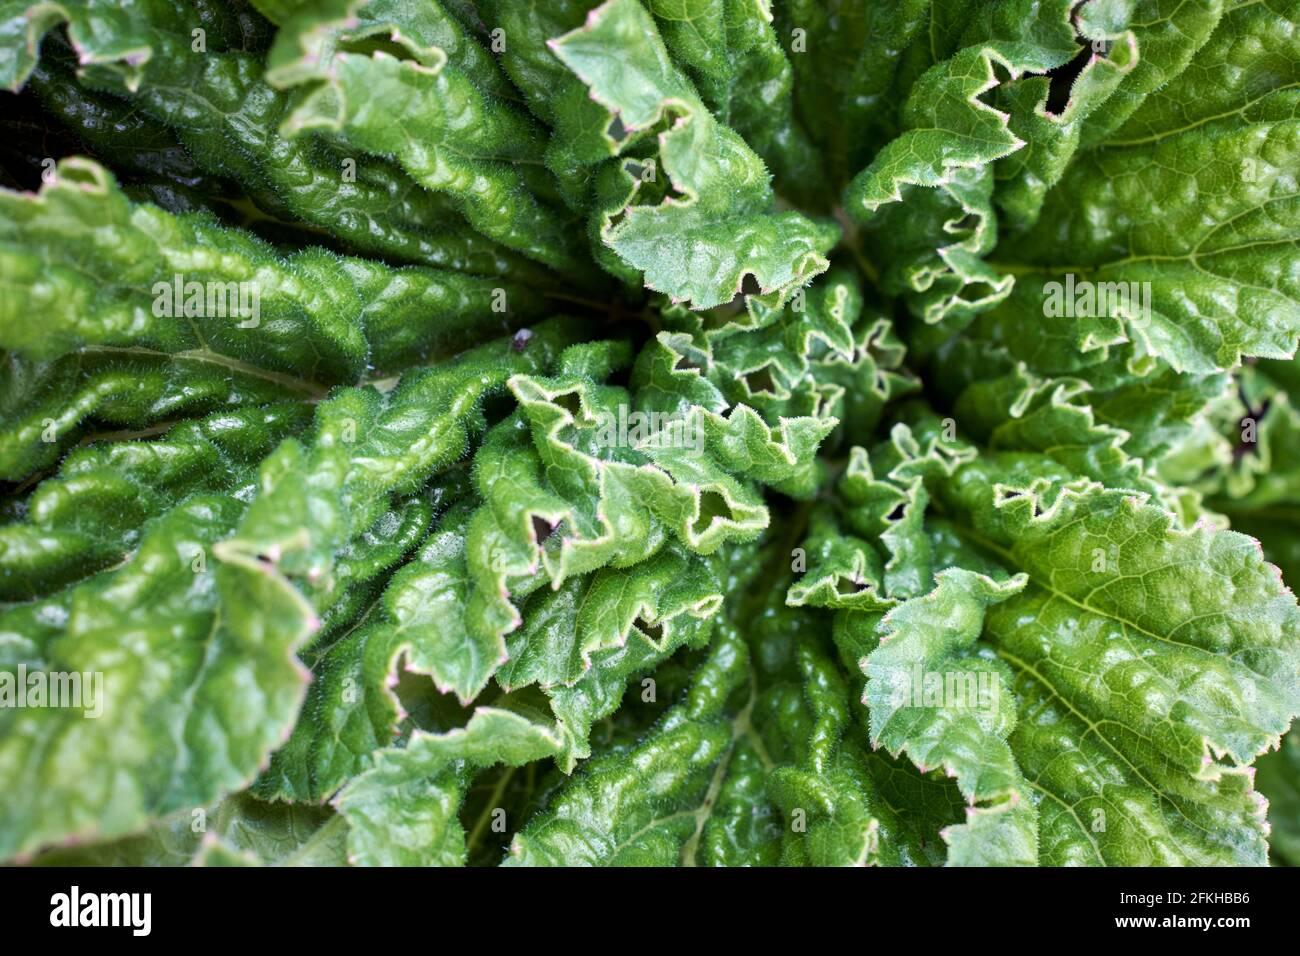 Gunnera tinctoria (Molina) Mirb. (Gunneraceae) also known as Pangue, Nalca (Mapuche voices), or Giant Chilean Rhubarb in closeup Stock Photo